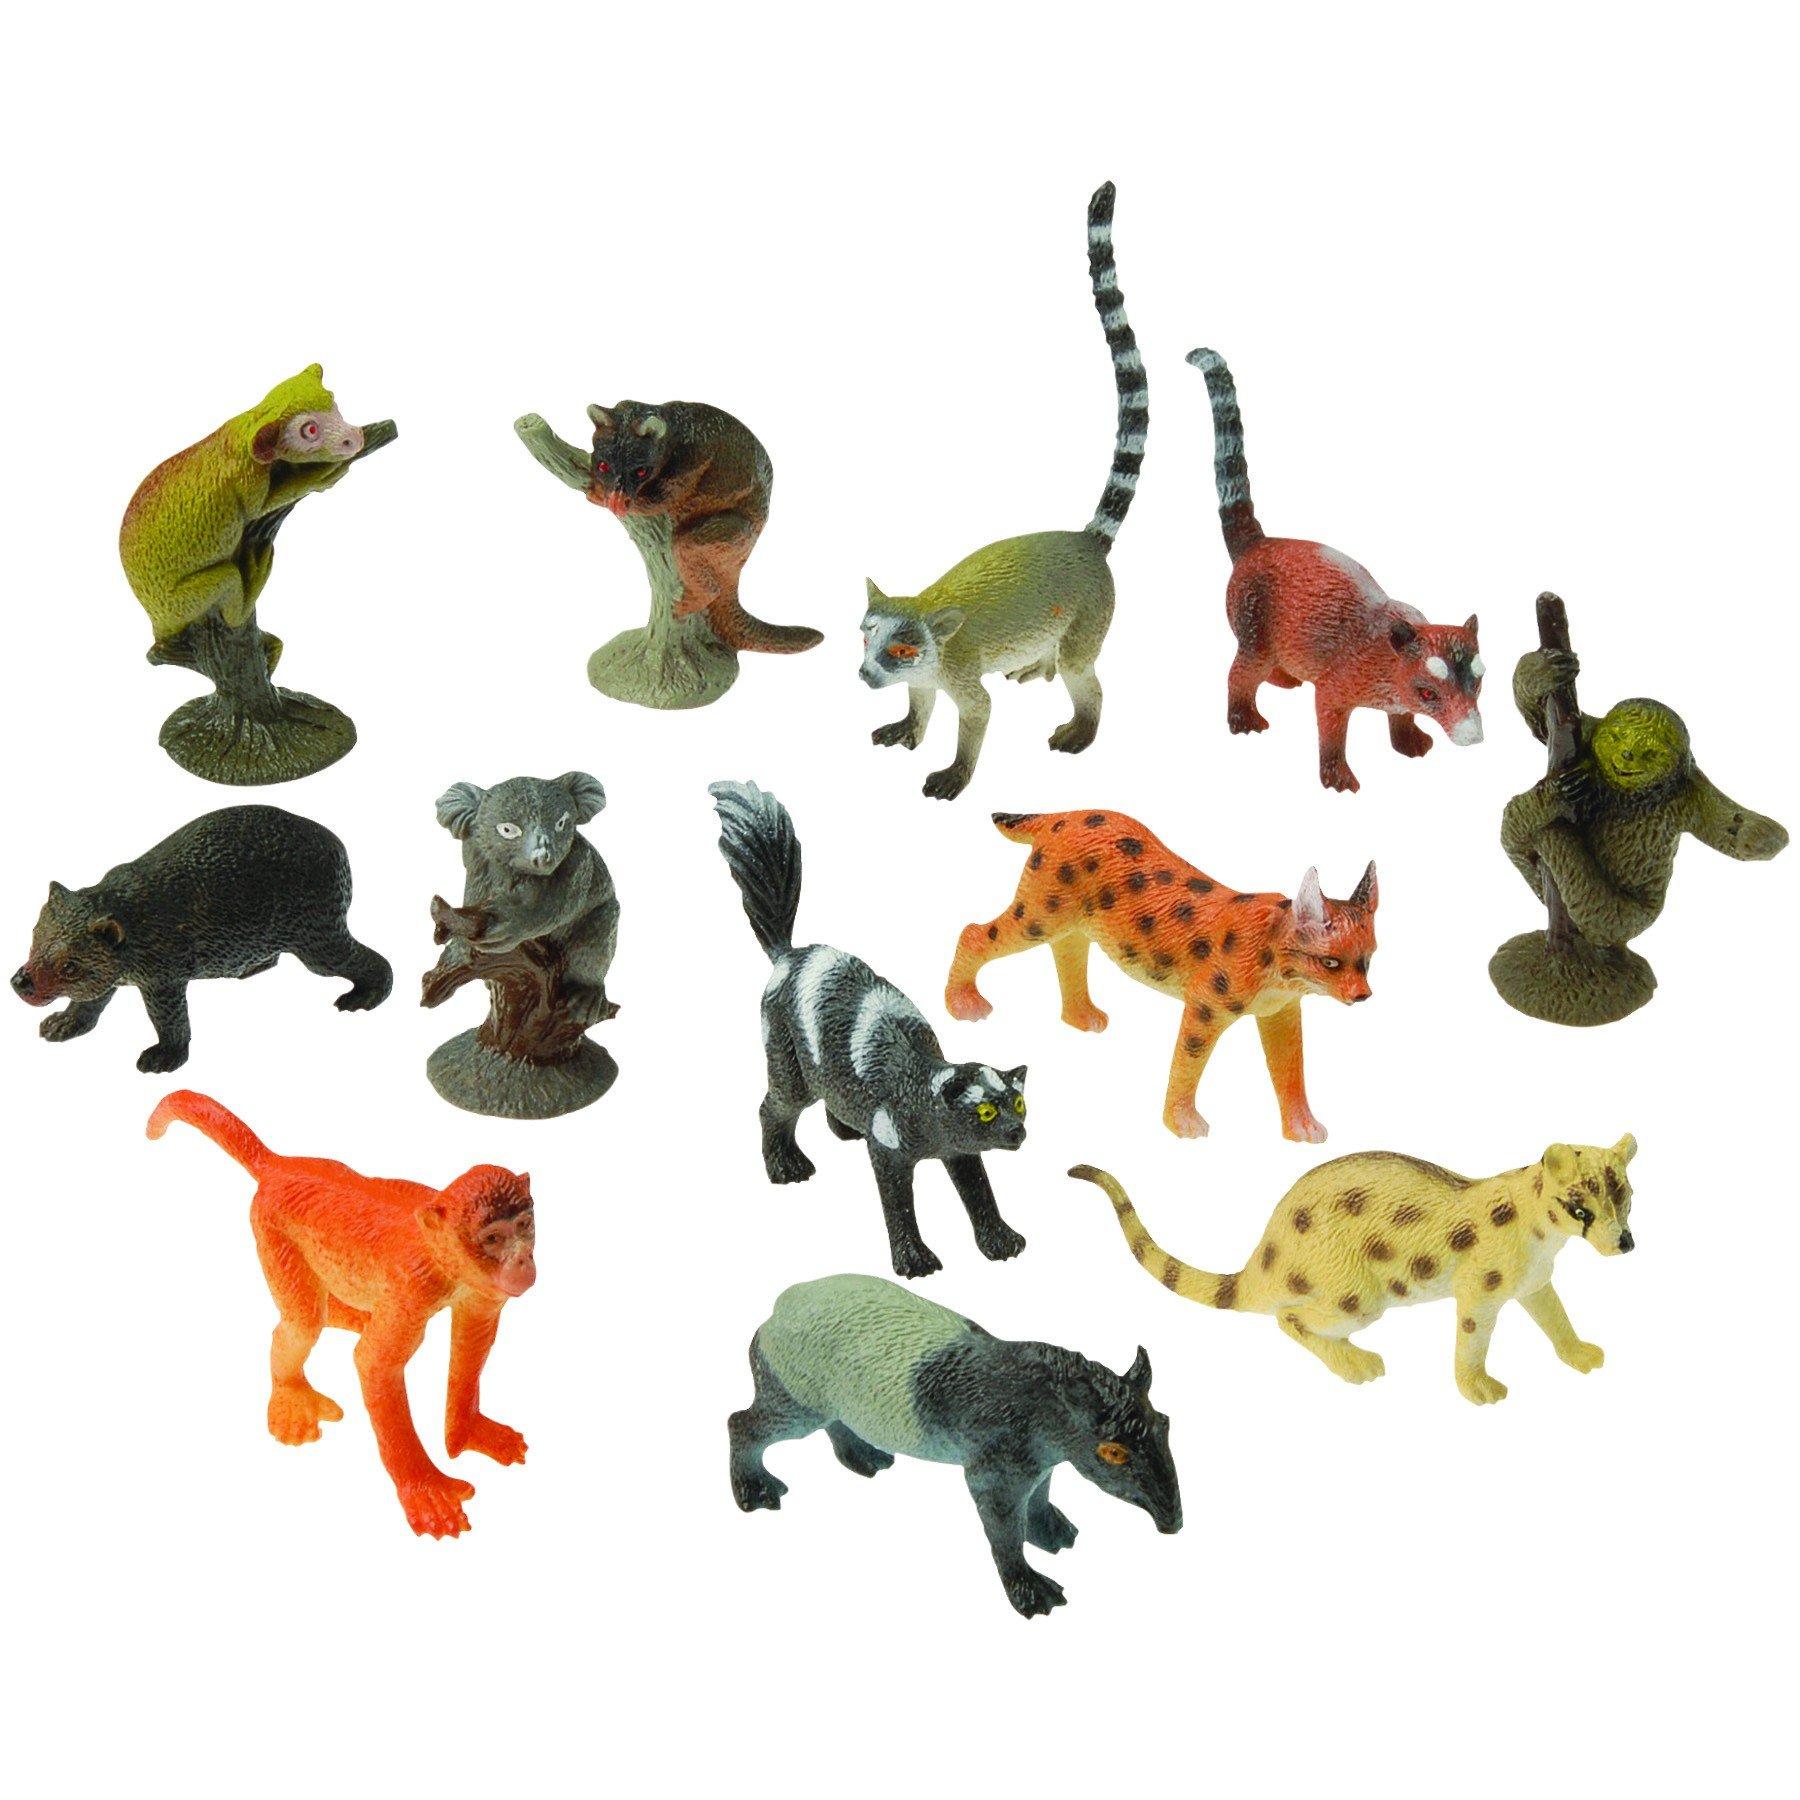 2 Dozen (24) Mini RAINFOREST ANIMAL Toy Figures - 1.5'' - 2.5'' PARTY Favors - Prizes - Pretend Play Gorilla APE Sloth LEMUR